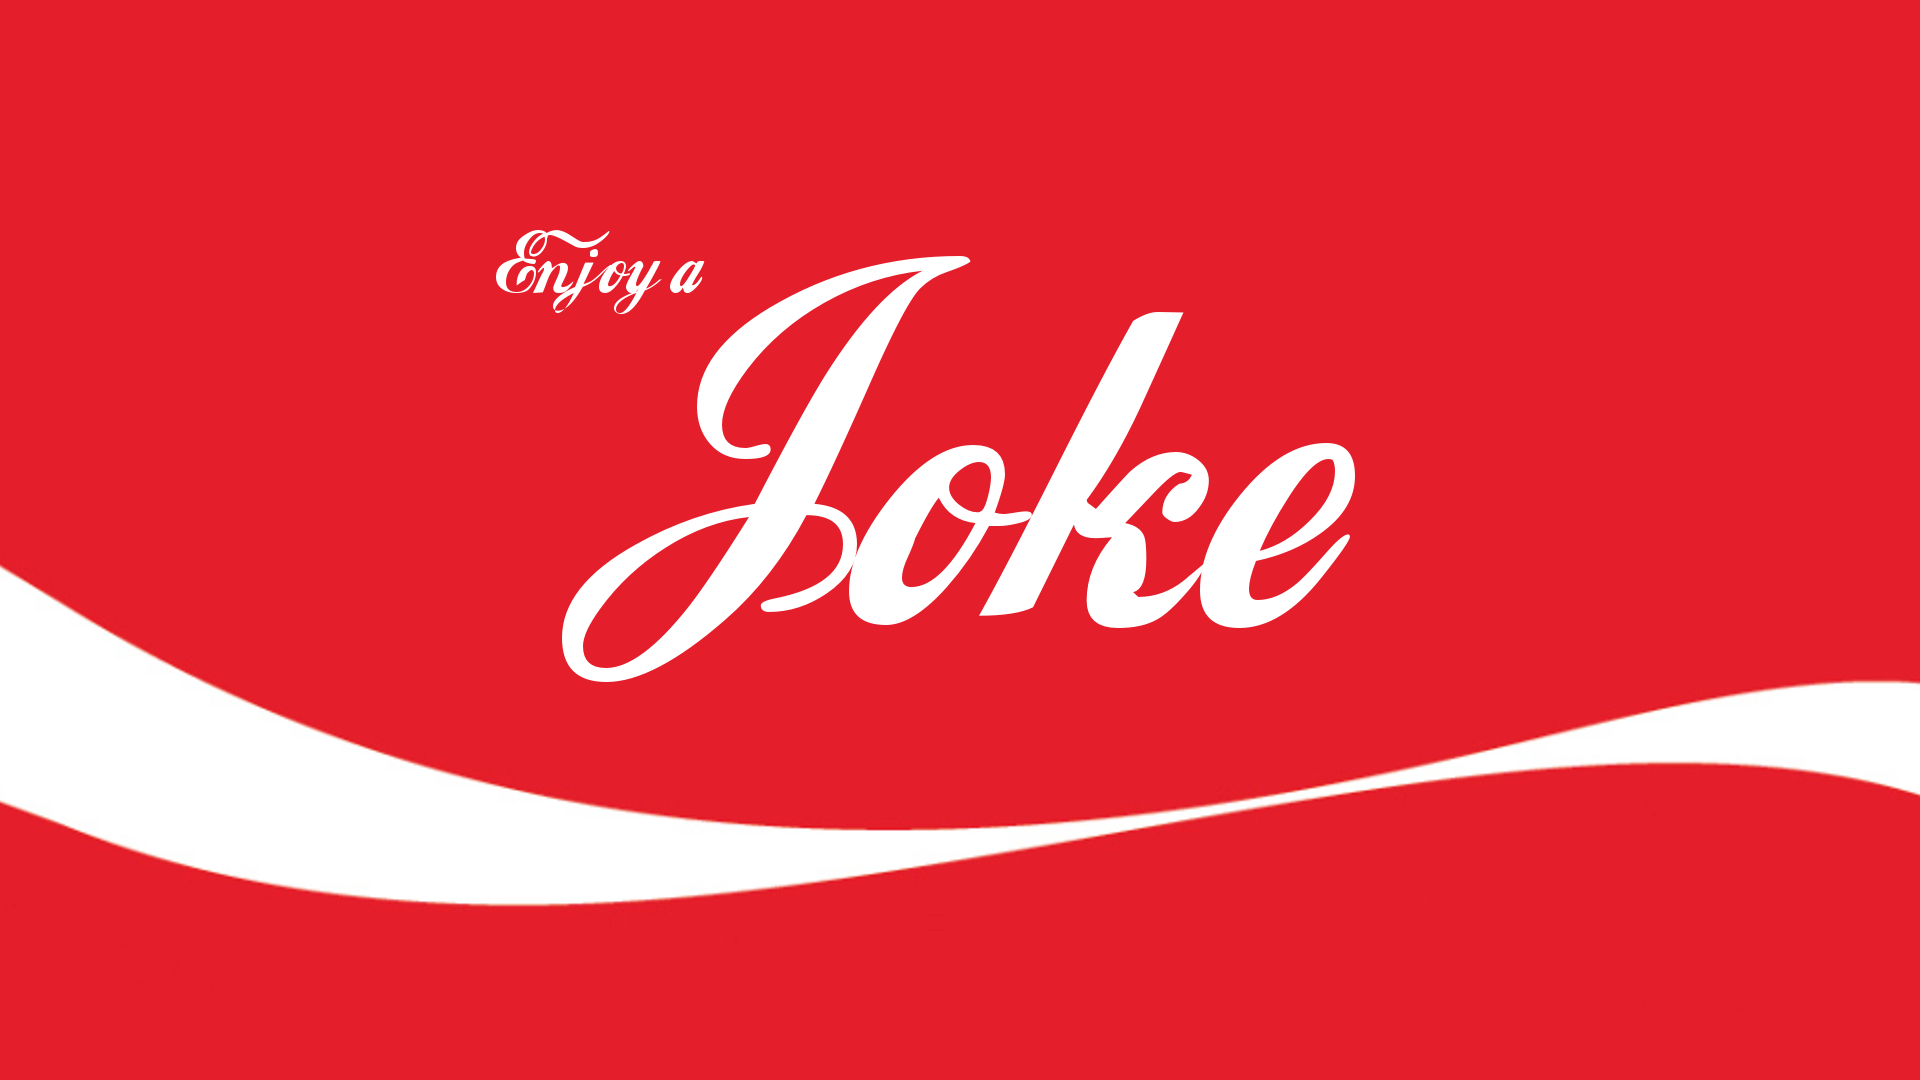 coke joke wallpapers 2 wallpaper funny 74542 high quality